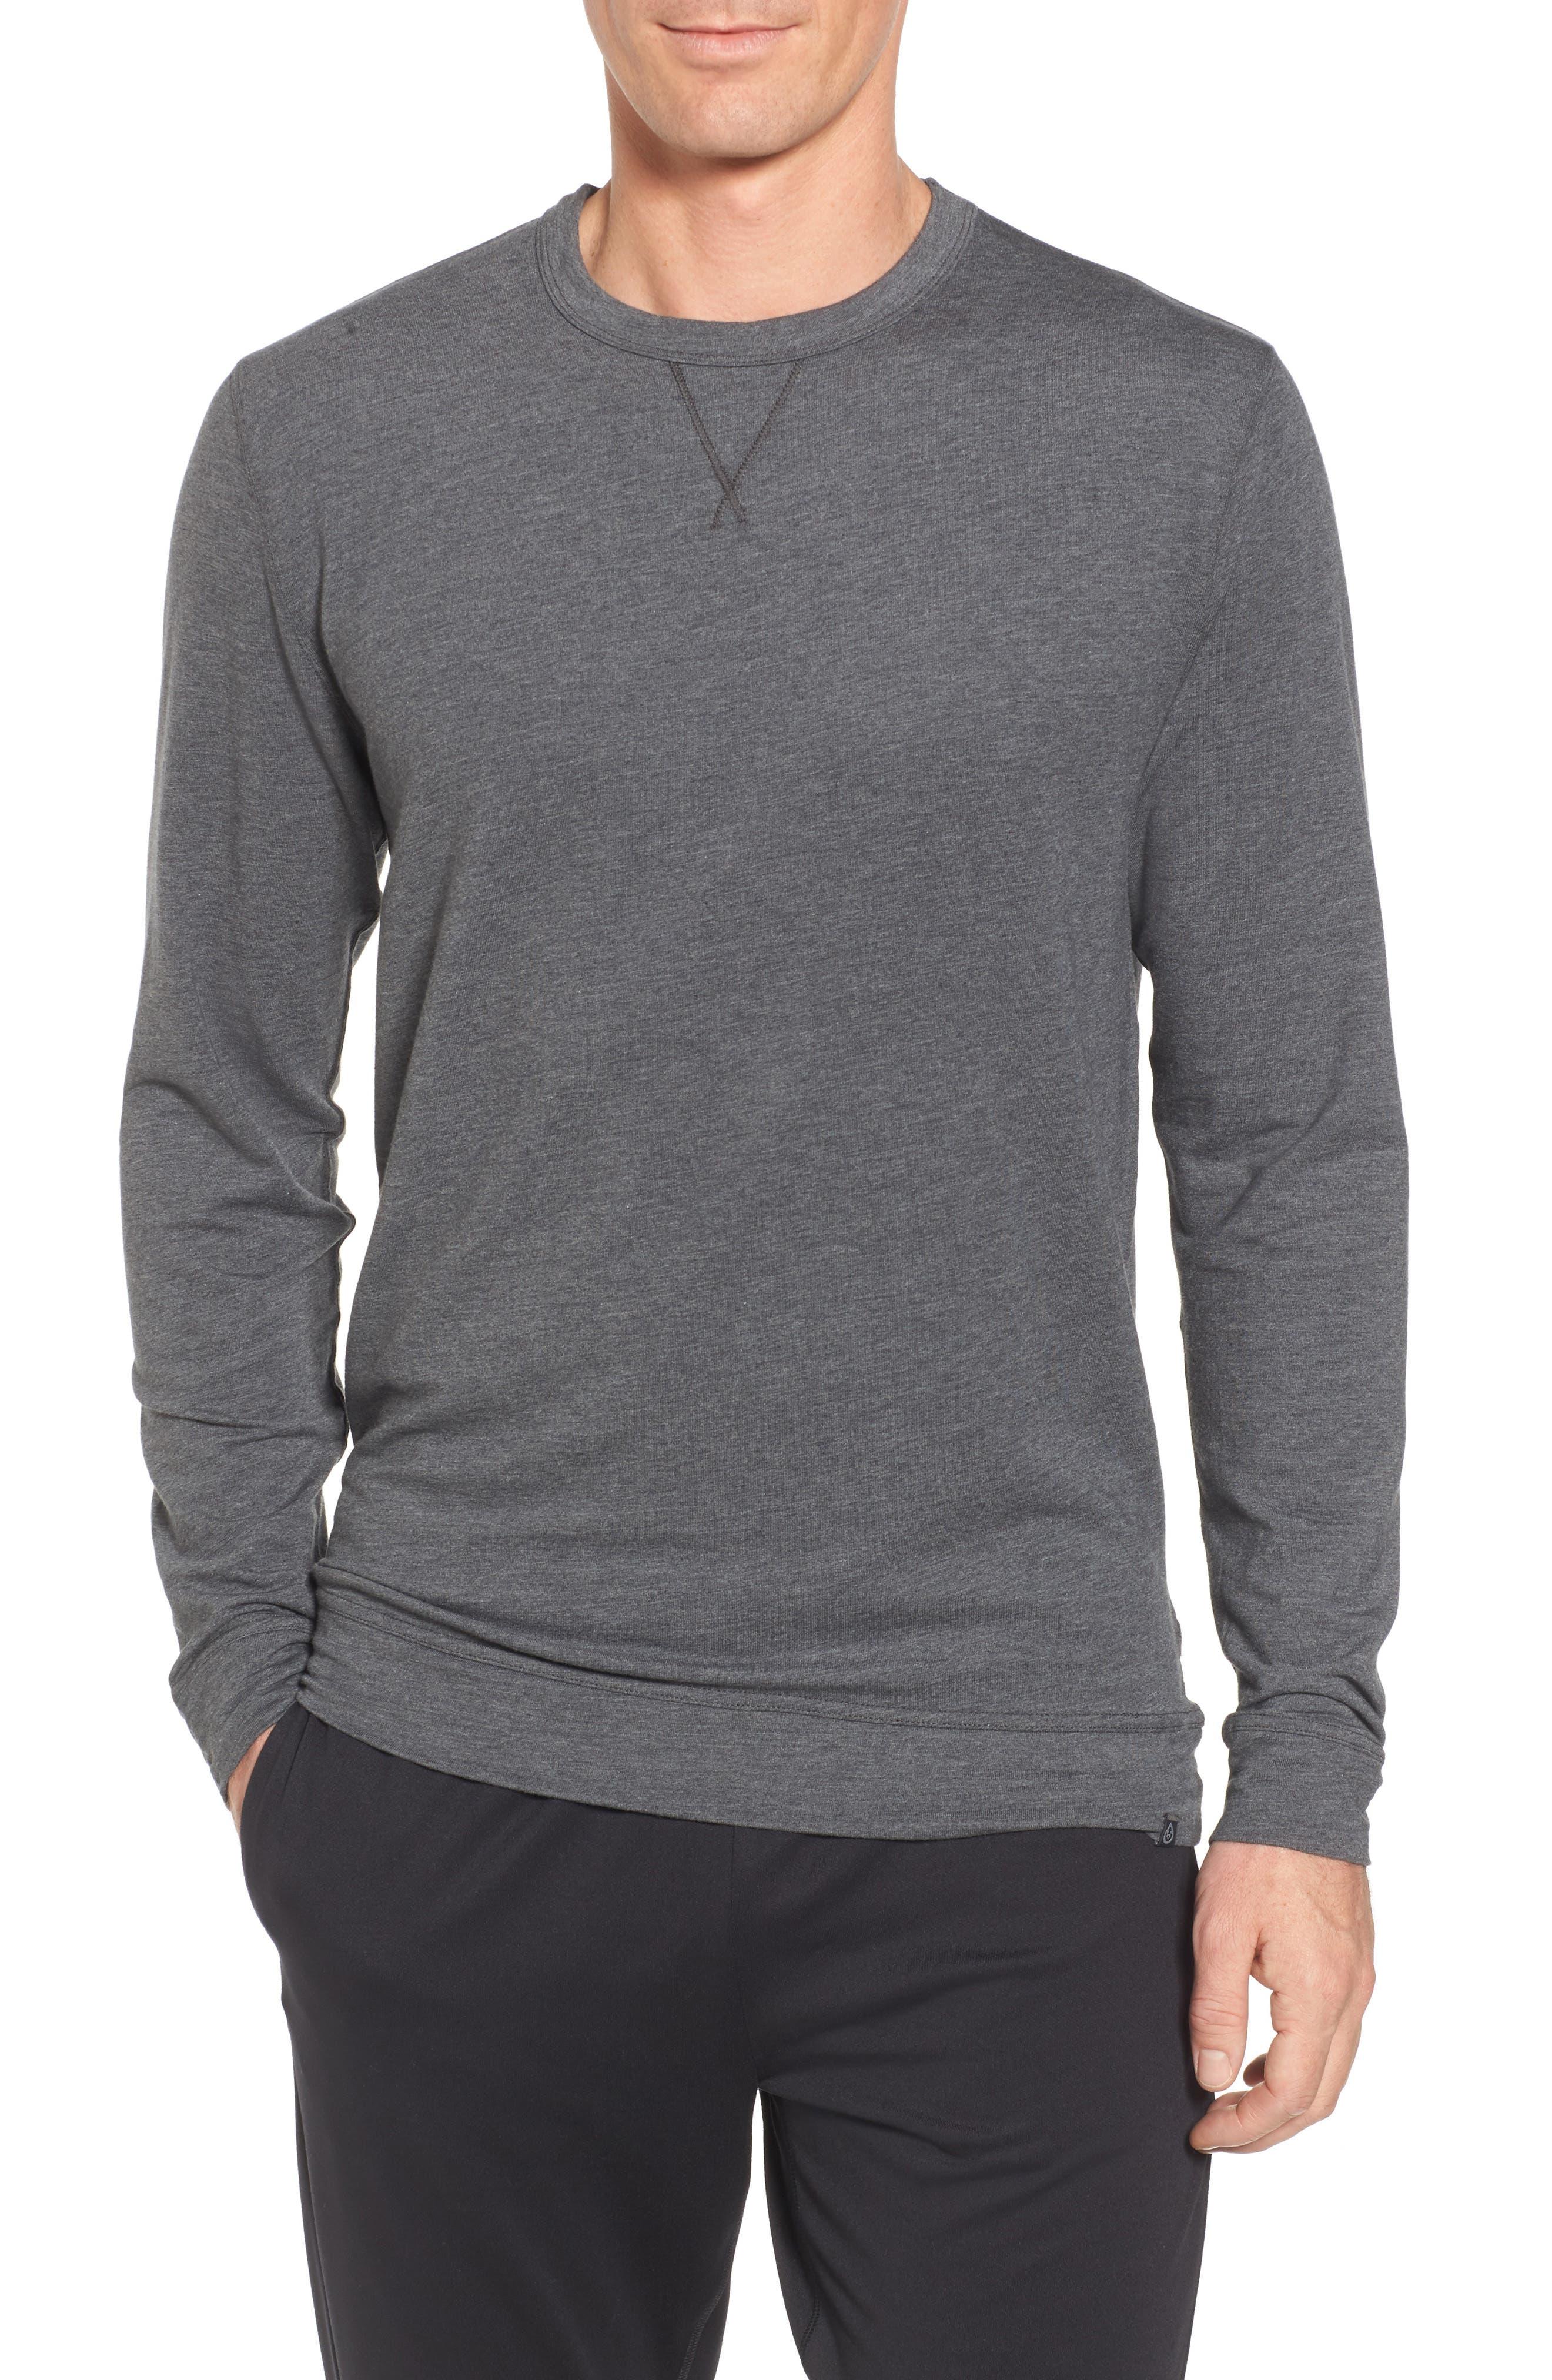 TASC PERFORMANCE, Legacy Crewneck Sweatshirt, Main thumbnail 1, color, BLACK HEATHER